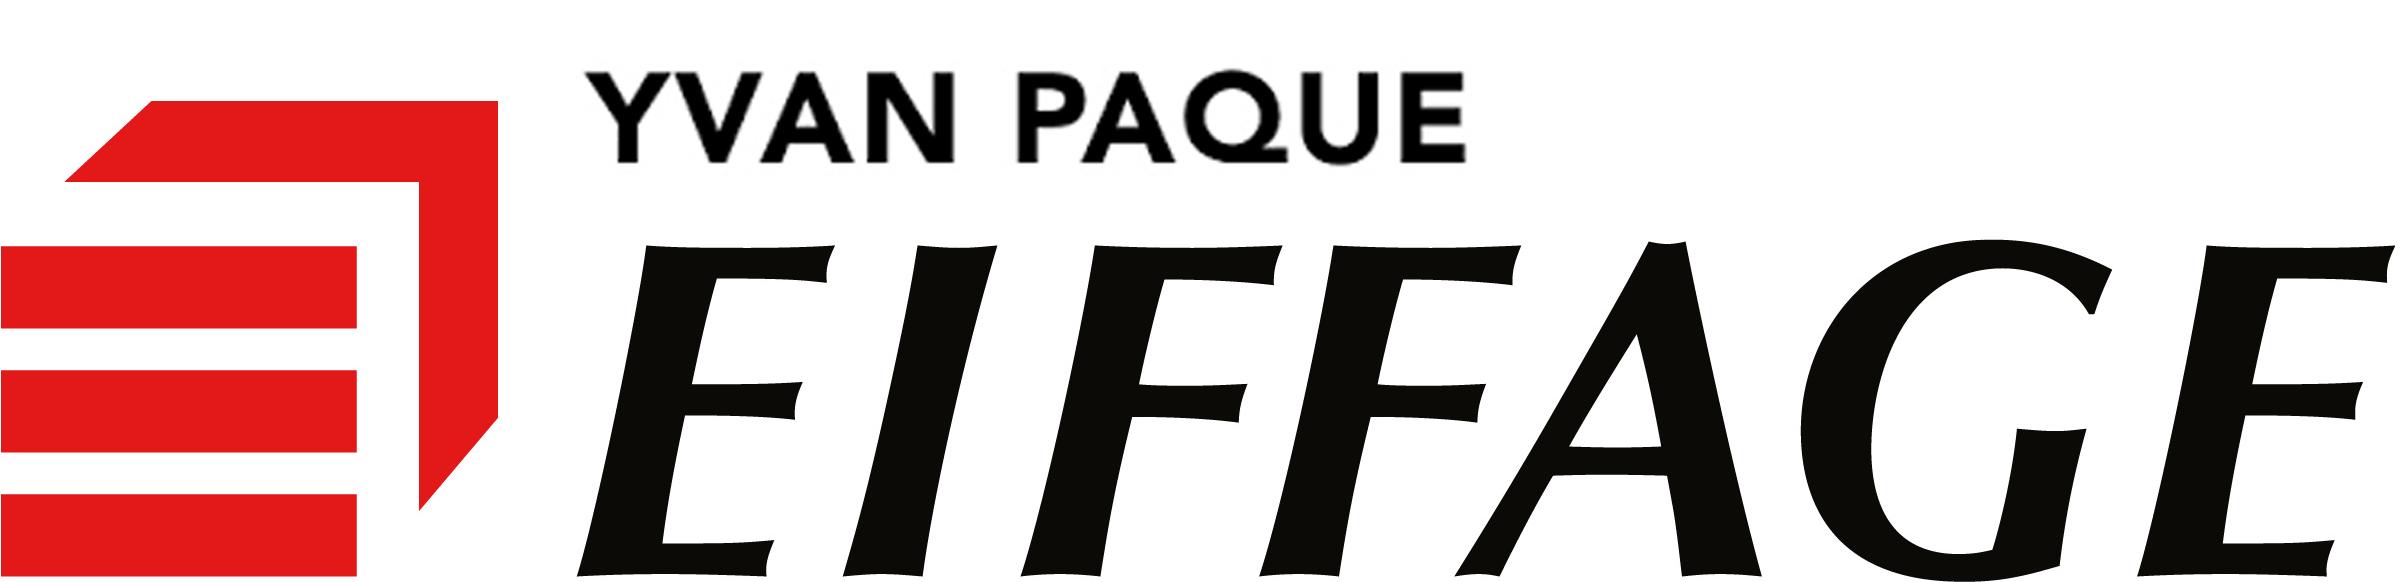 EIFFAGE Yvan PAQUE logo